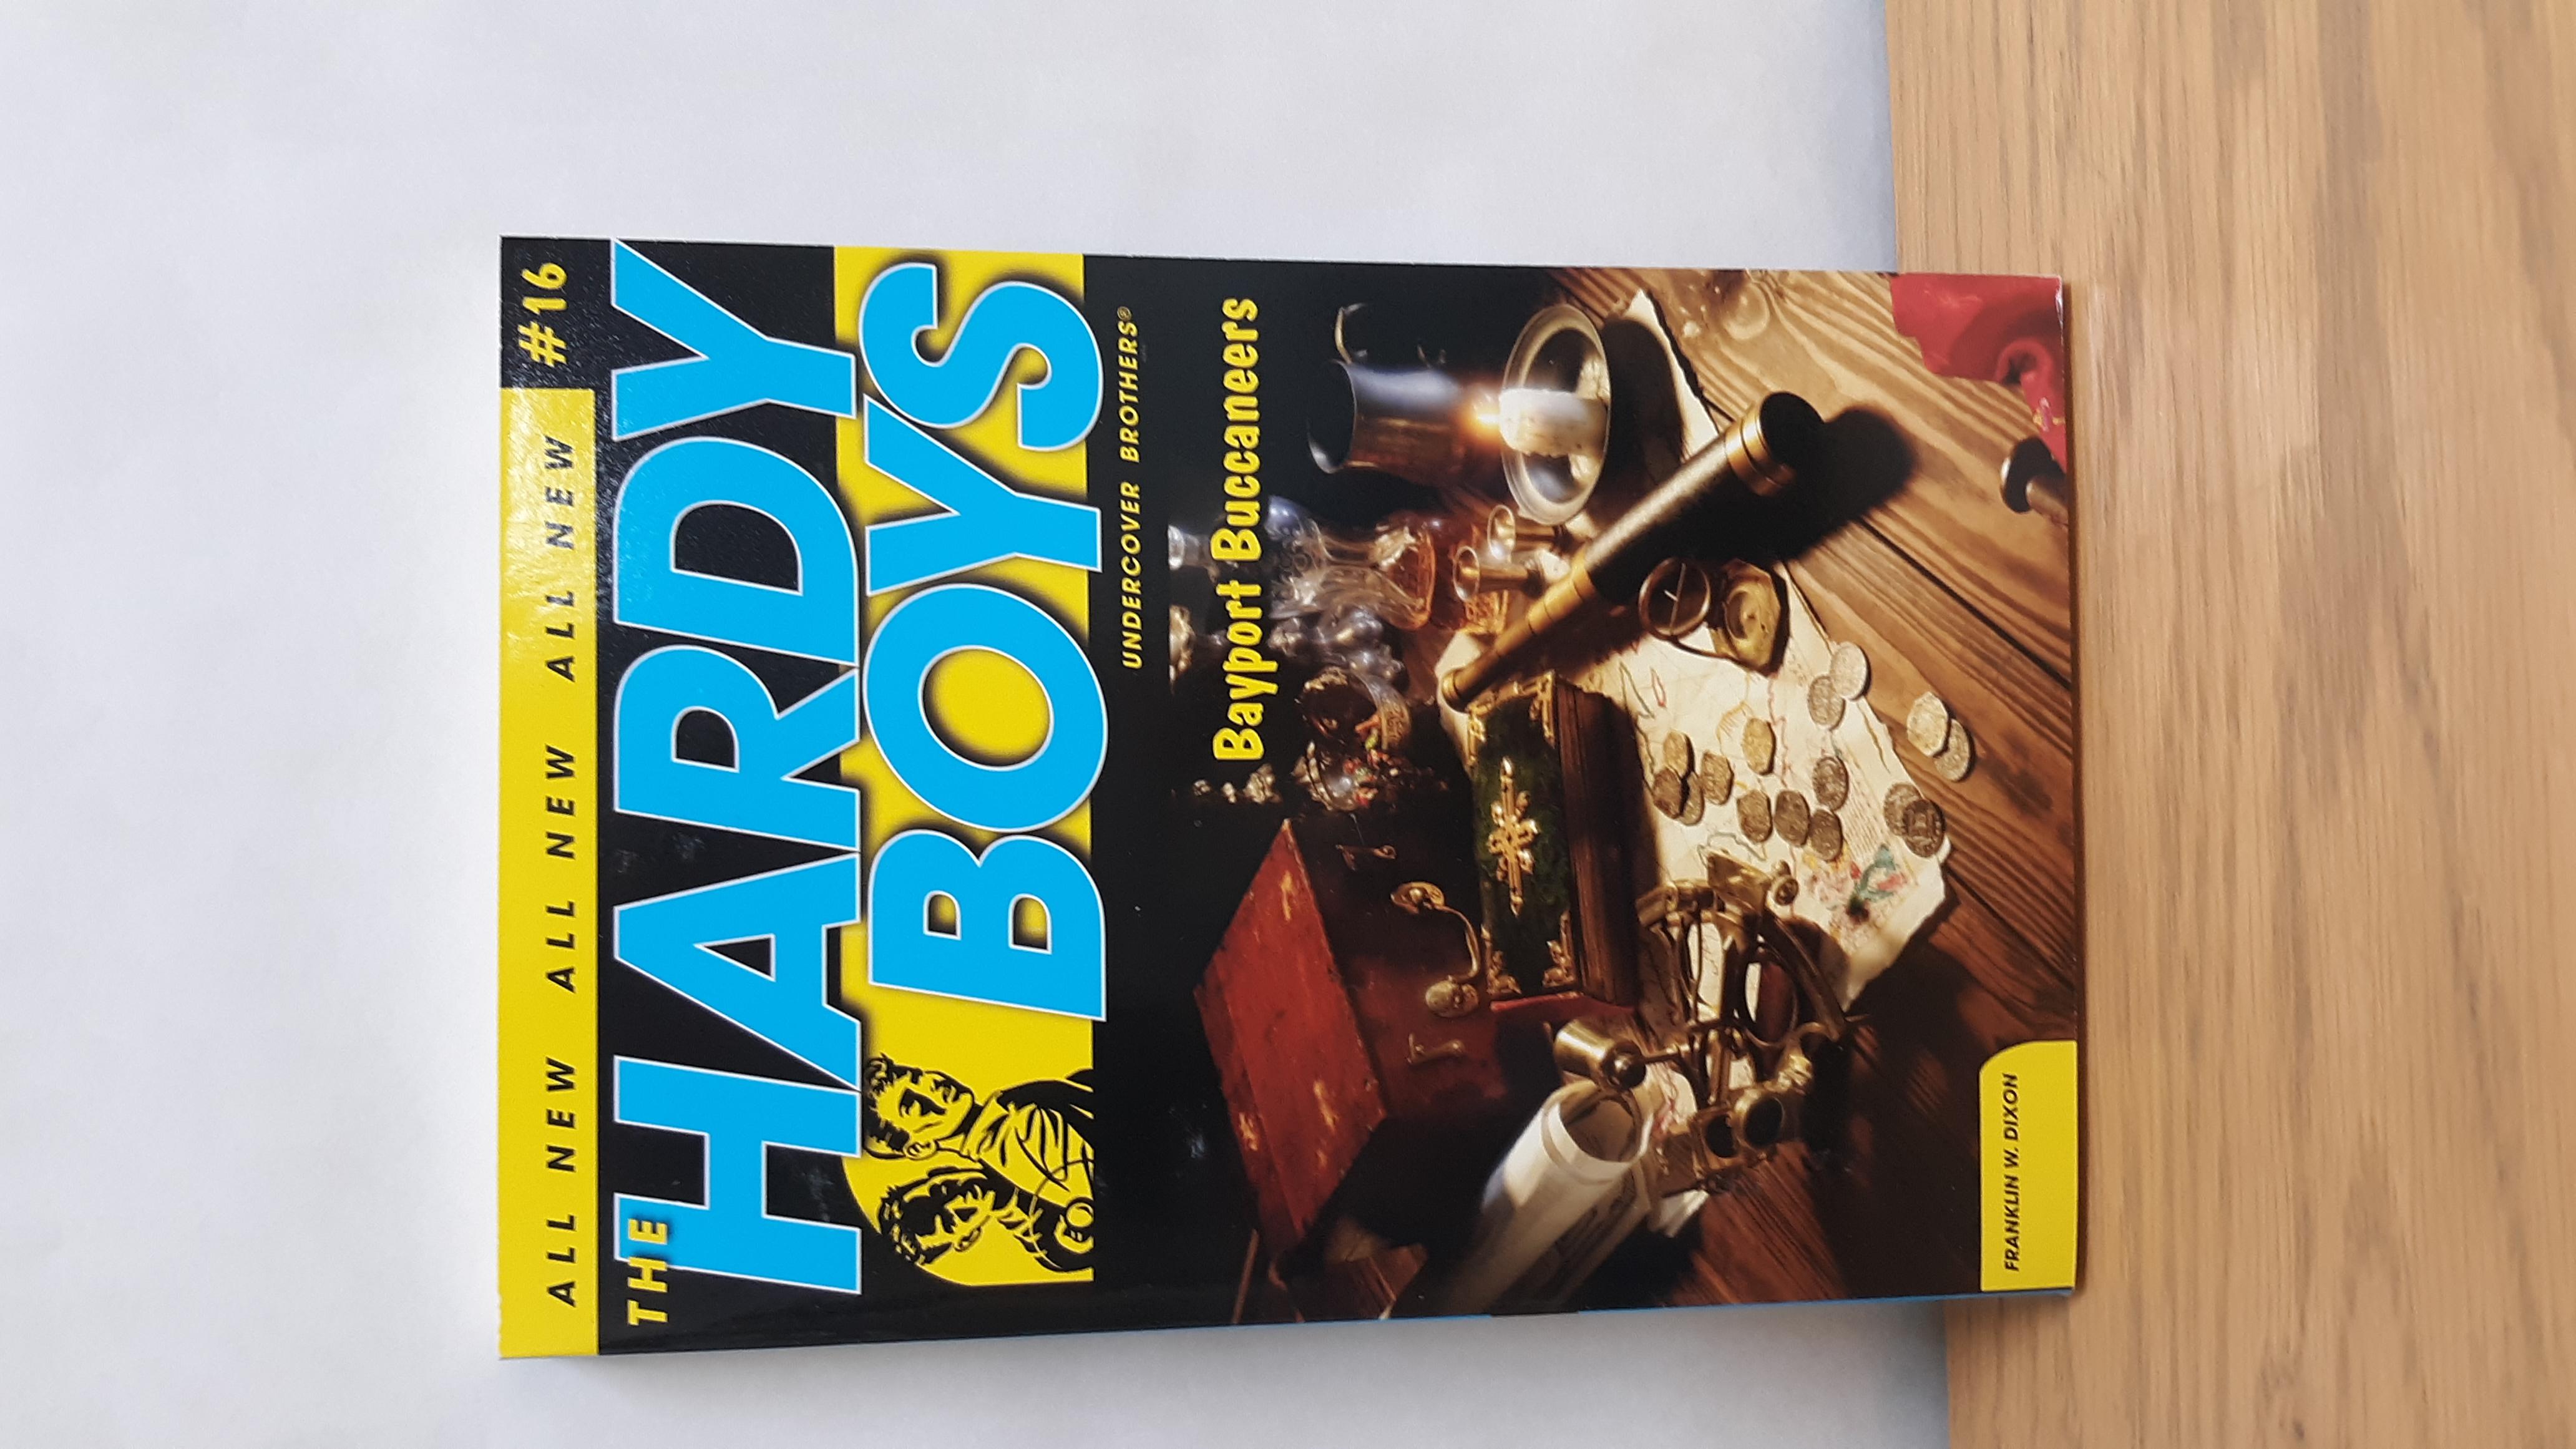 https://0201.nccdn.net/1_2/000/000/0b4/900/hardy-boys-bayport.jpg